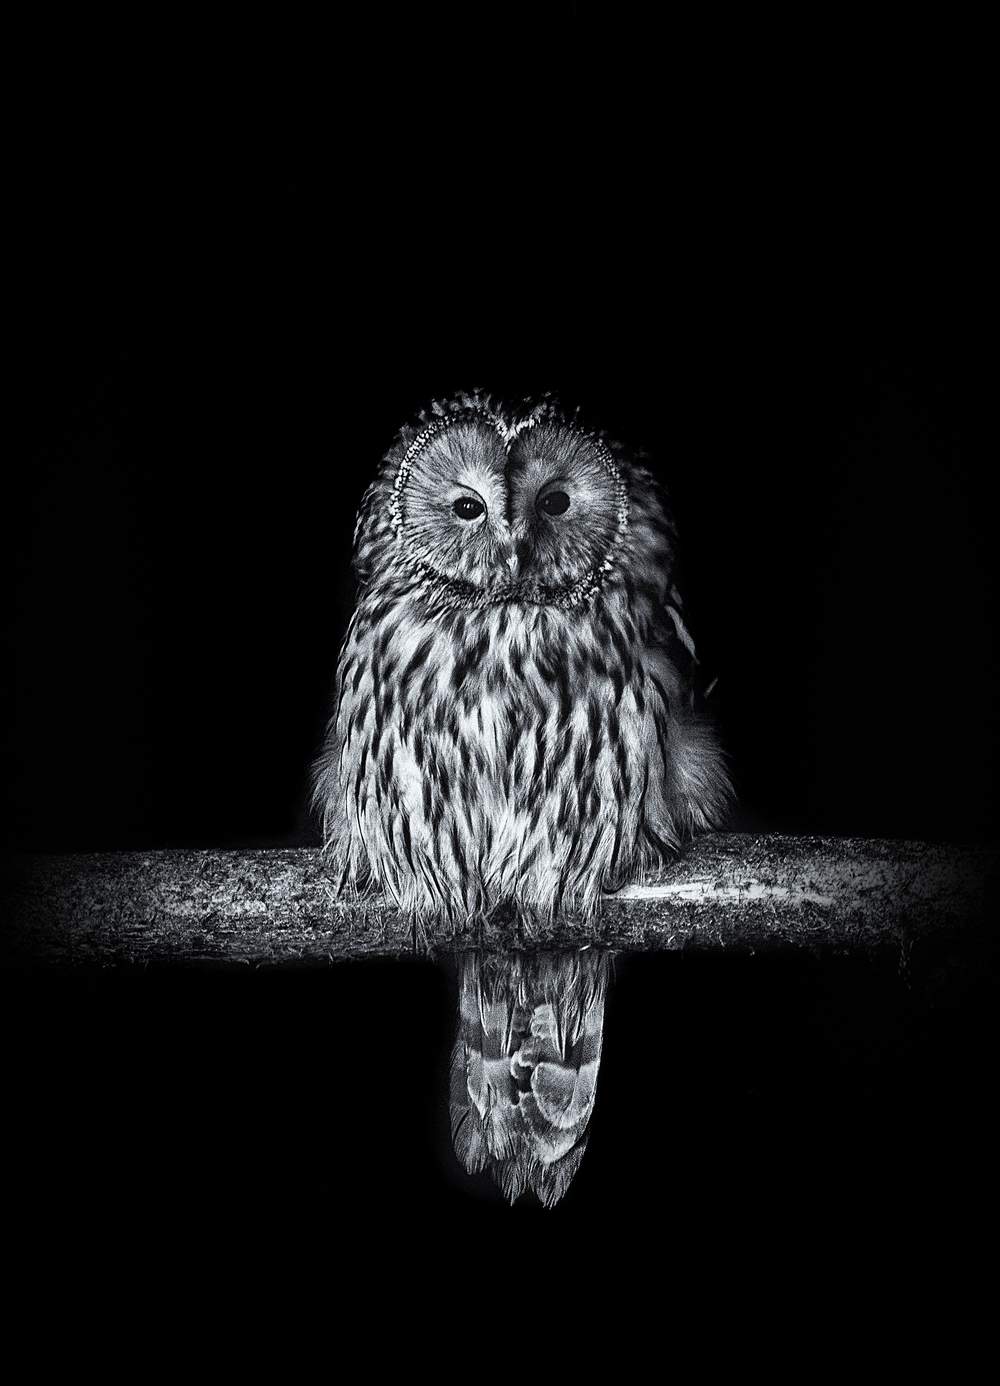 Owl 2 final.jpg